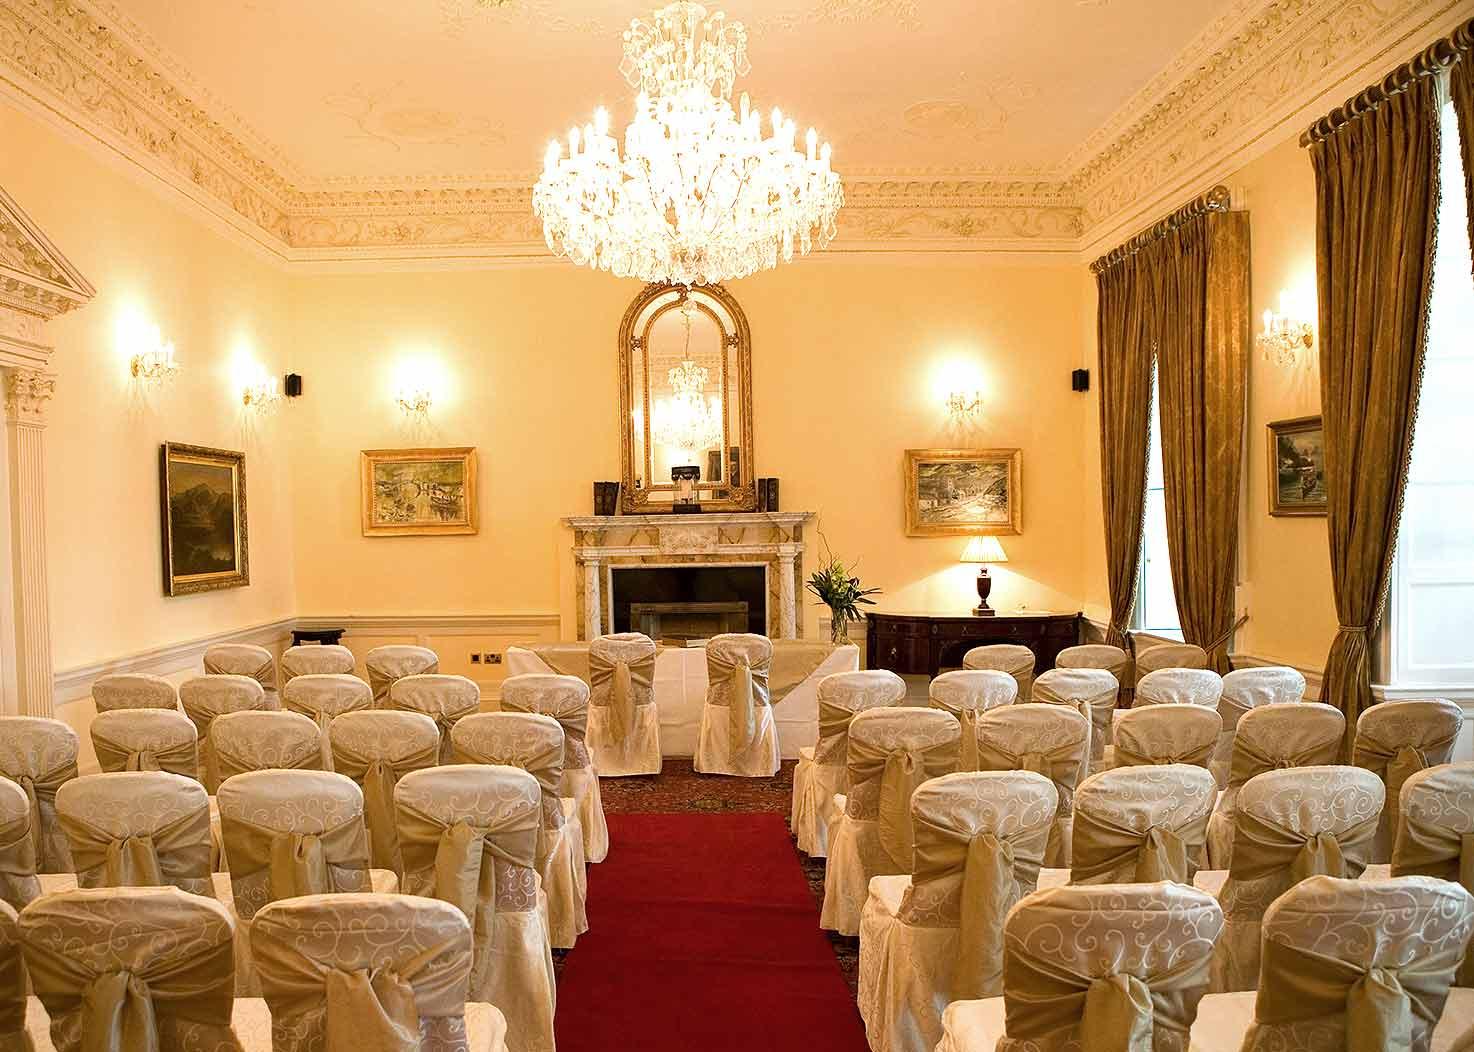 luxury castle wedding venue near dublin 4 dunboyne. Black Bedroom Furniture Sets. Home Design Ideas